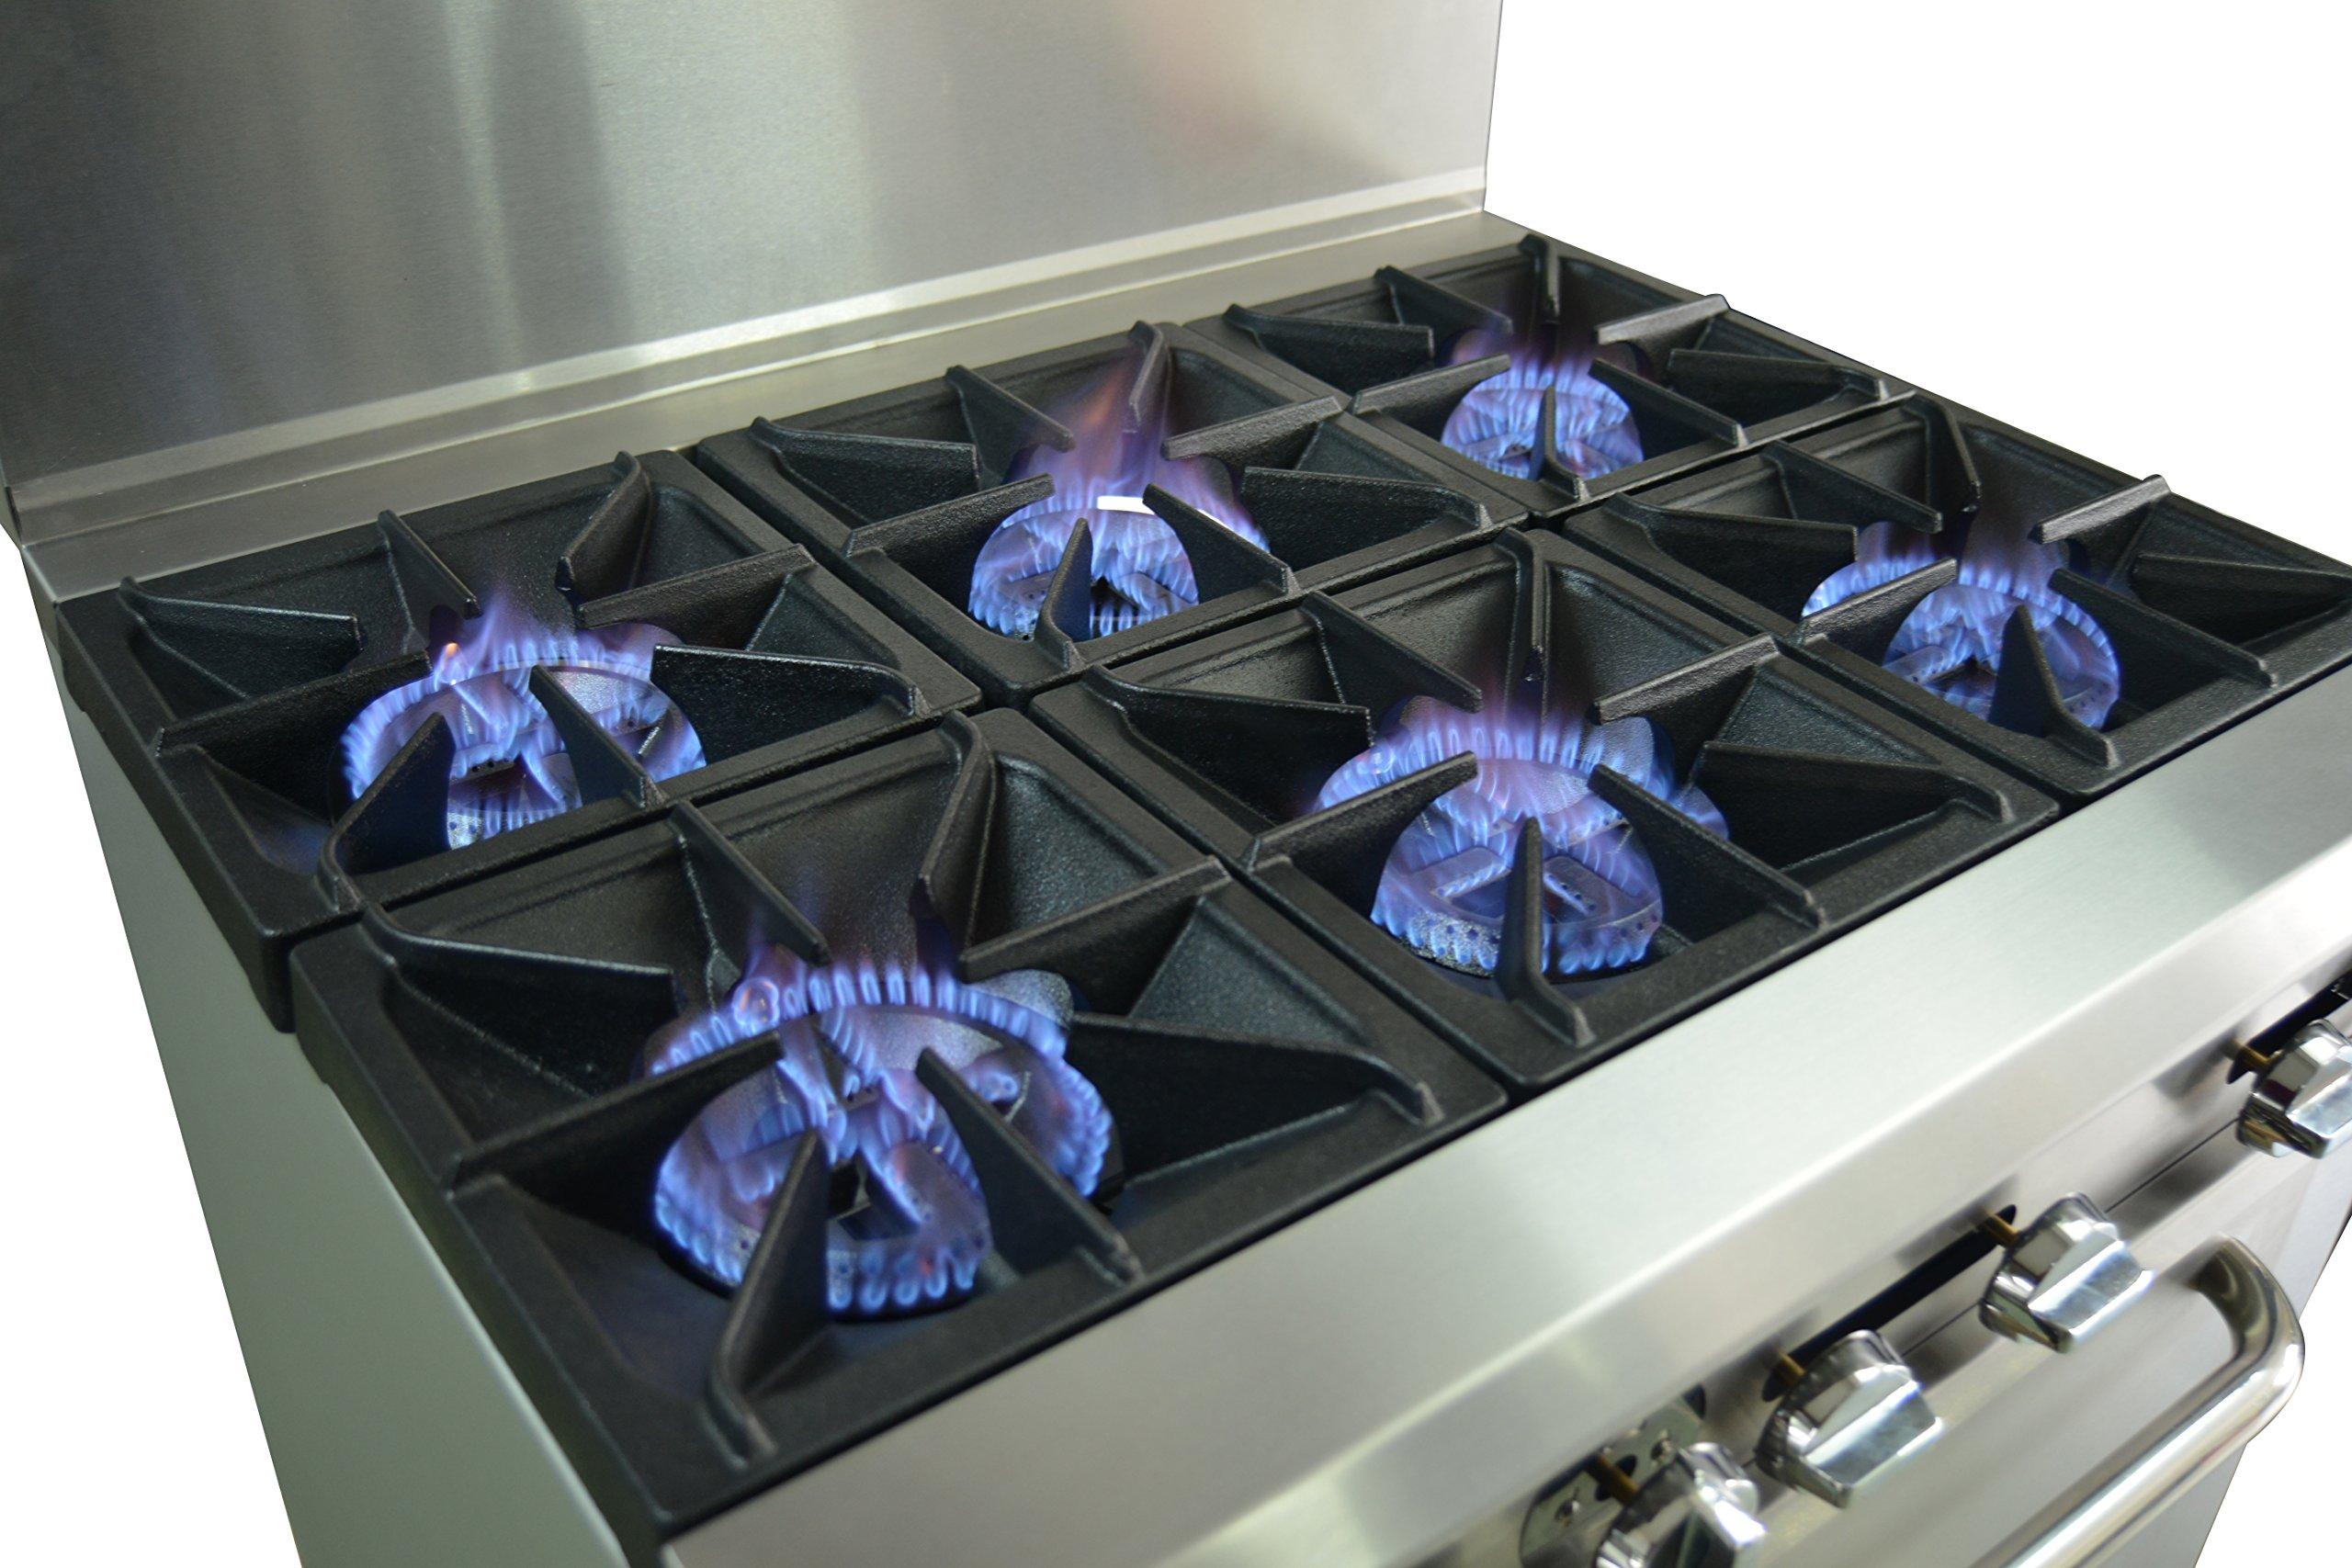 Hakka Heavy Duty Commercial 36'' Gas 6 Burners Range with Oven